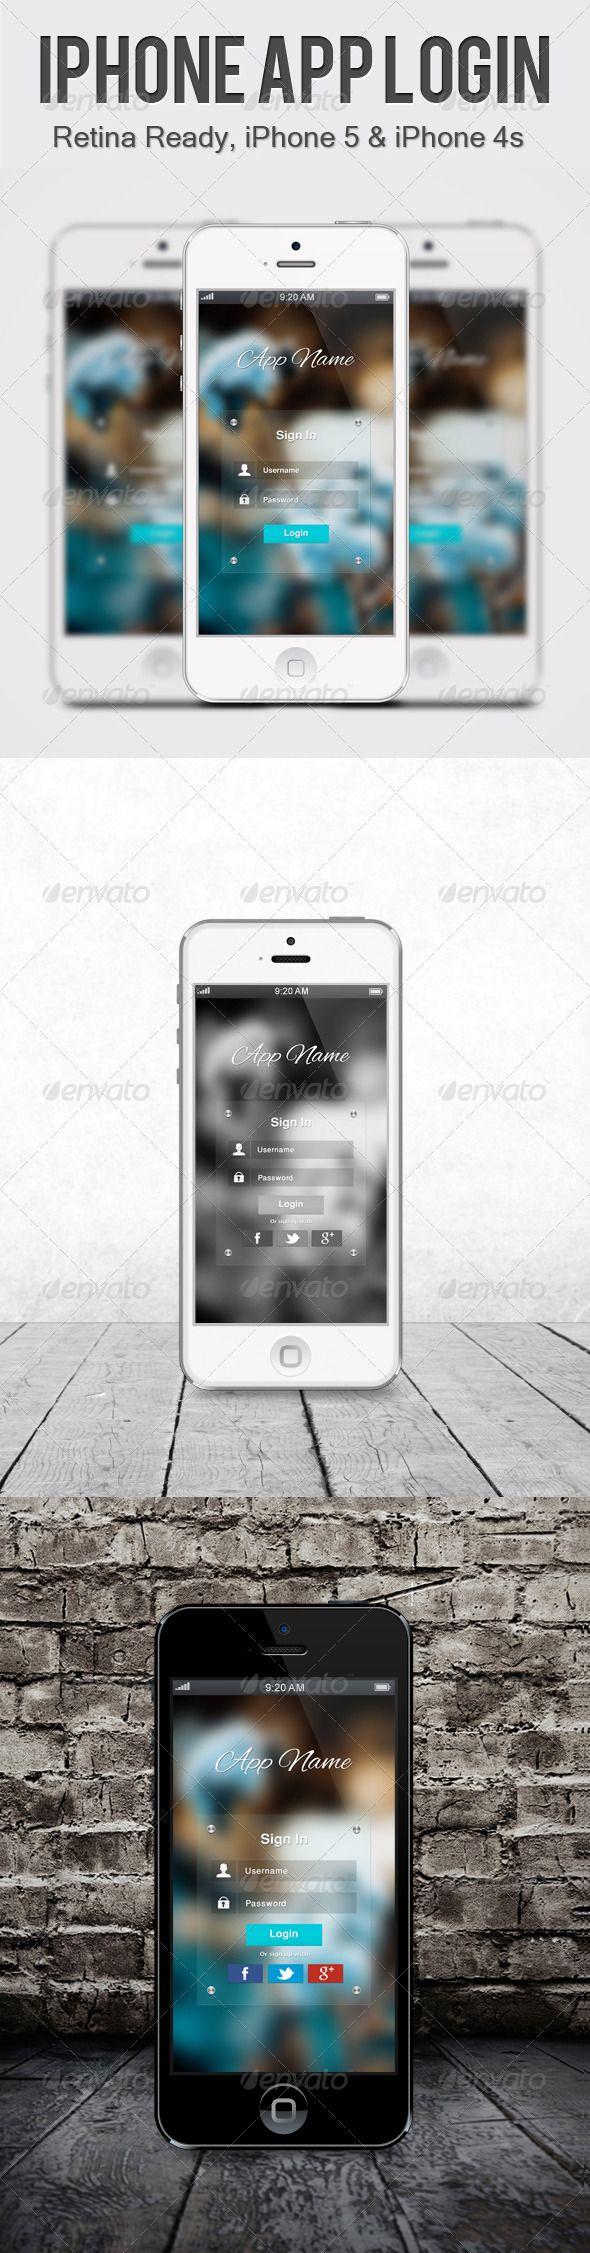 Transparent iPhone App Login Details ? Fully Editable